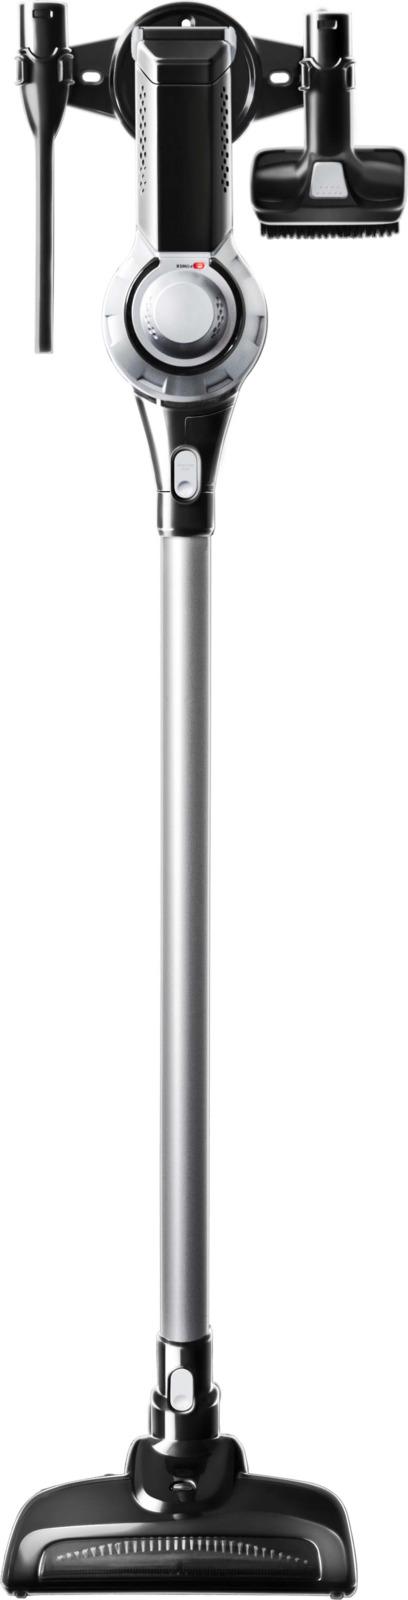 Пылесос Redmond RV-UR340